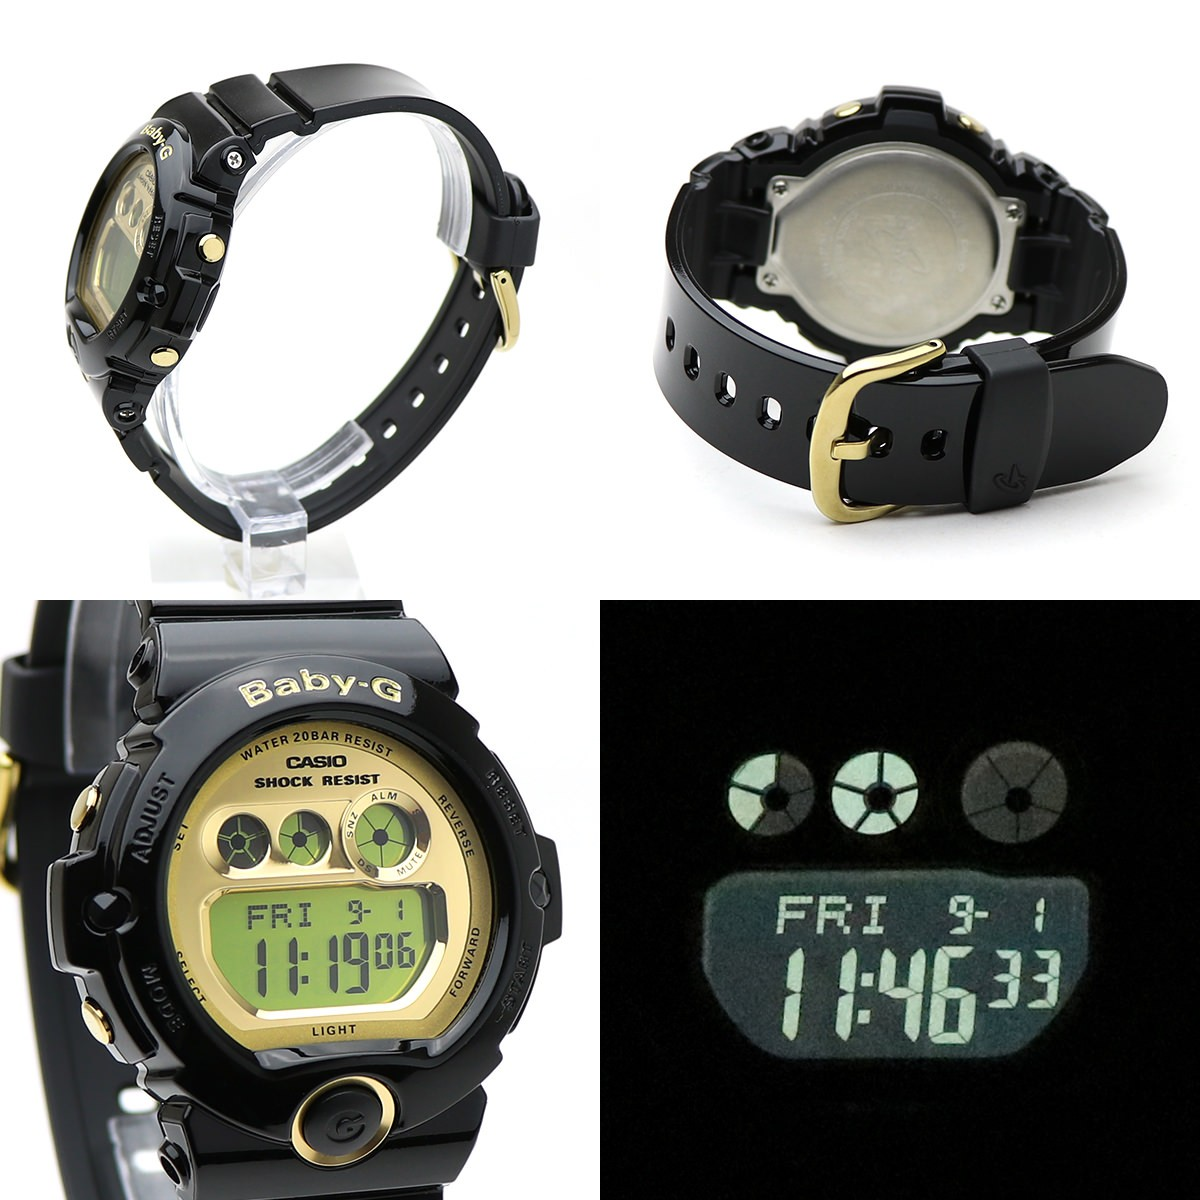 BABY-G ベビーG ベビージー 腕時計 CASIO カシオ 通販 送料無料